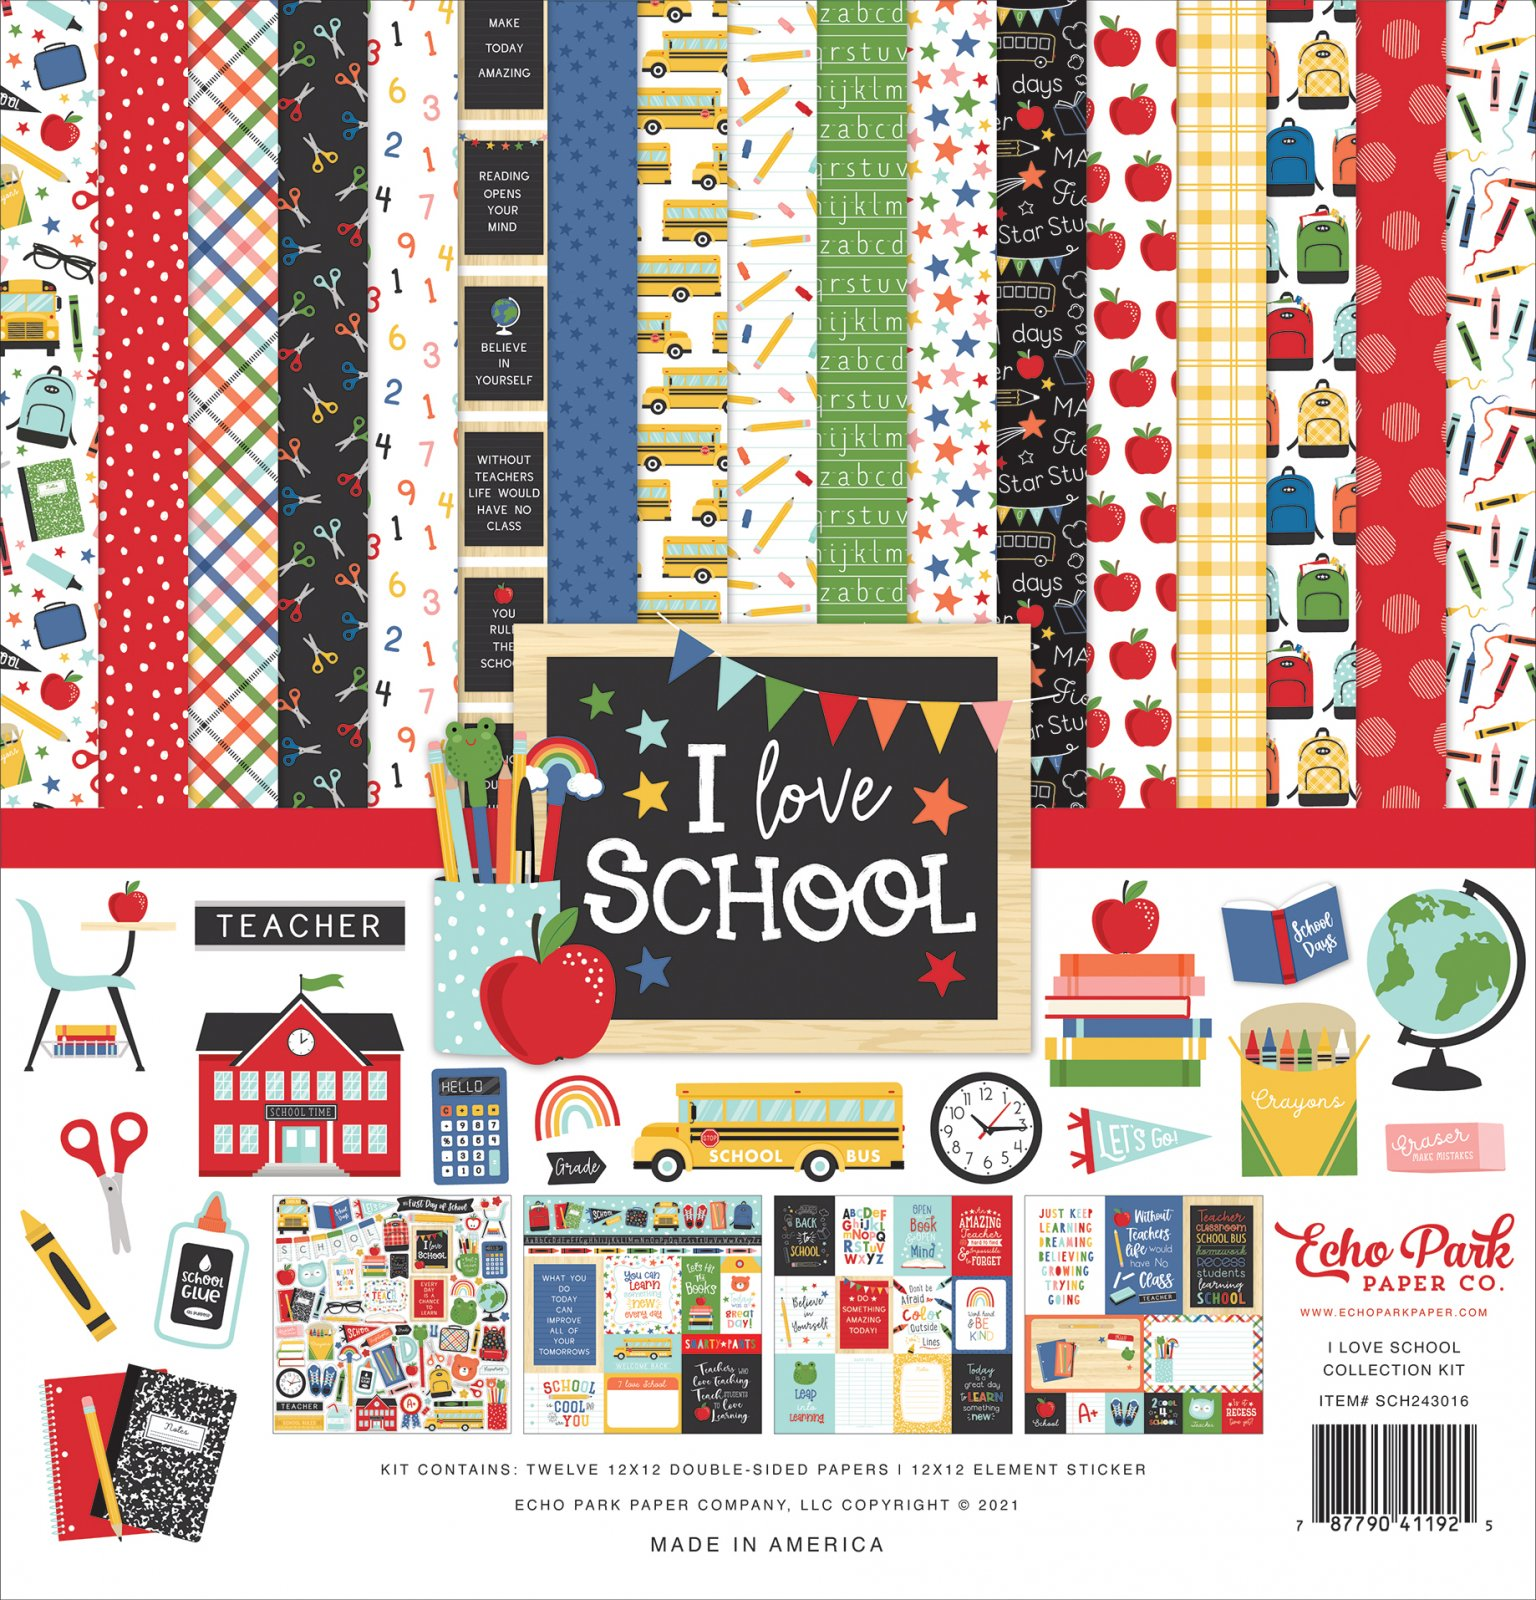 Echo Park Collection Kit 12x12 - I Love School